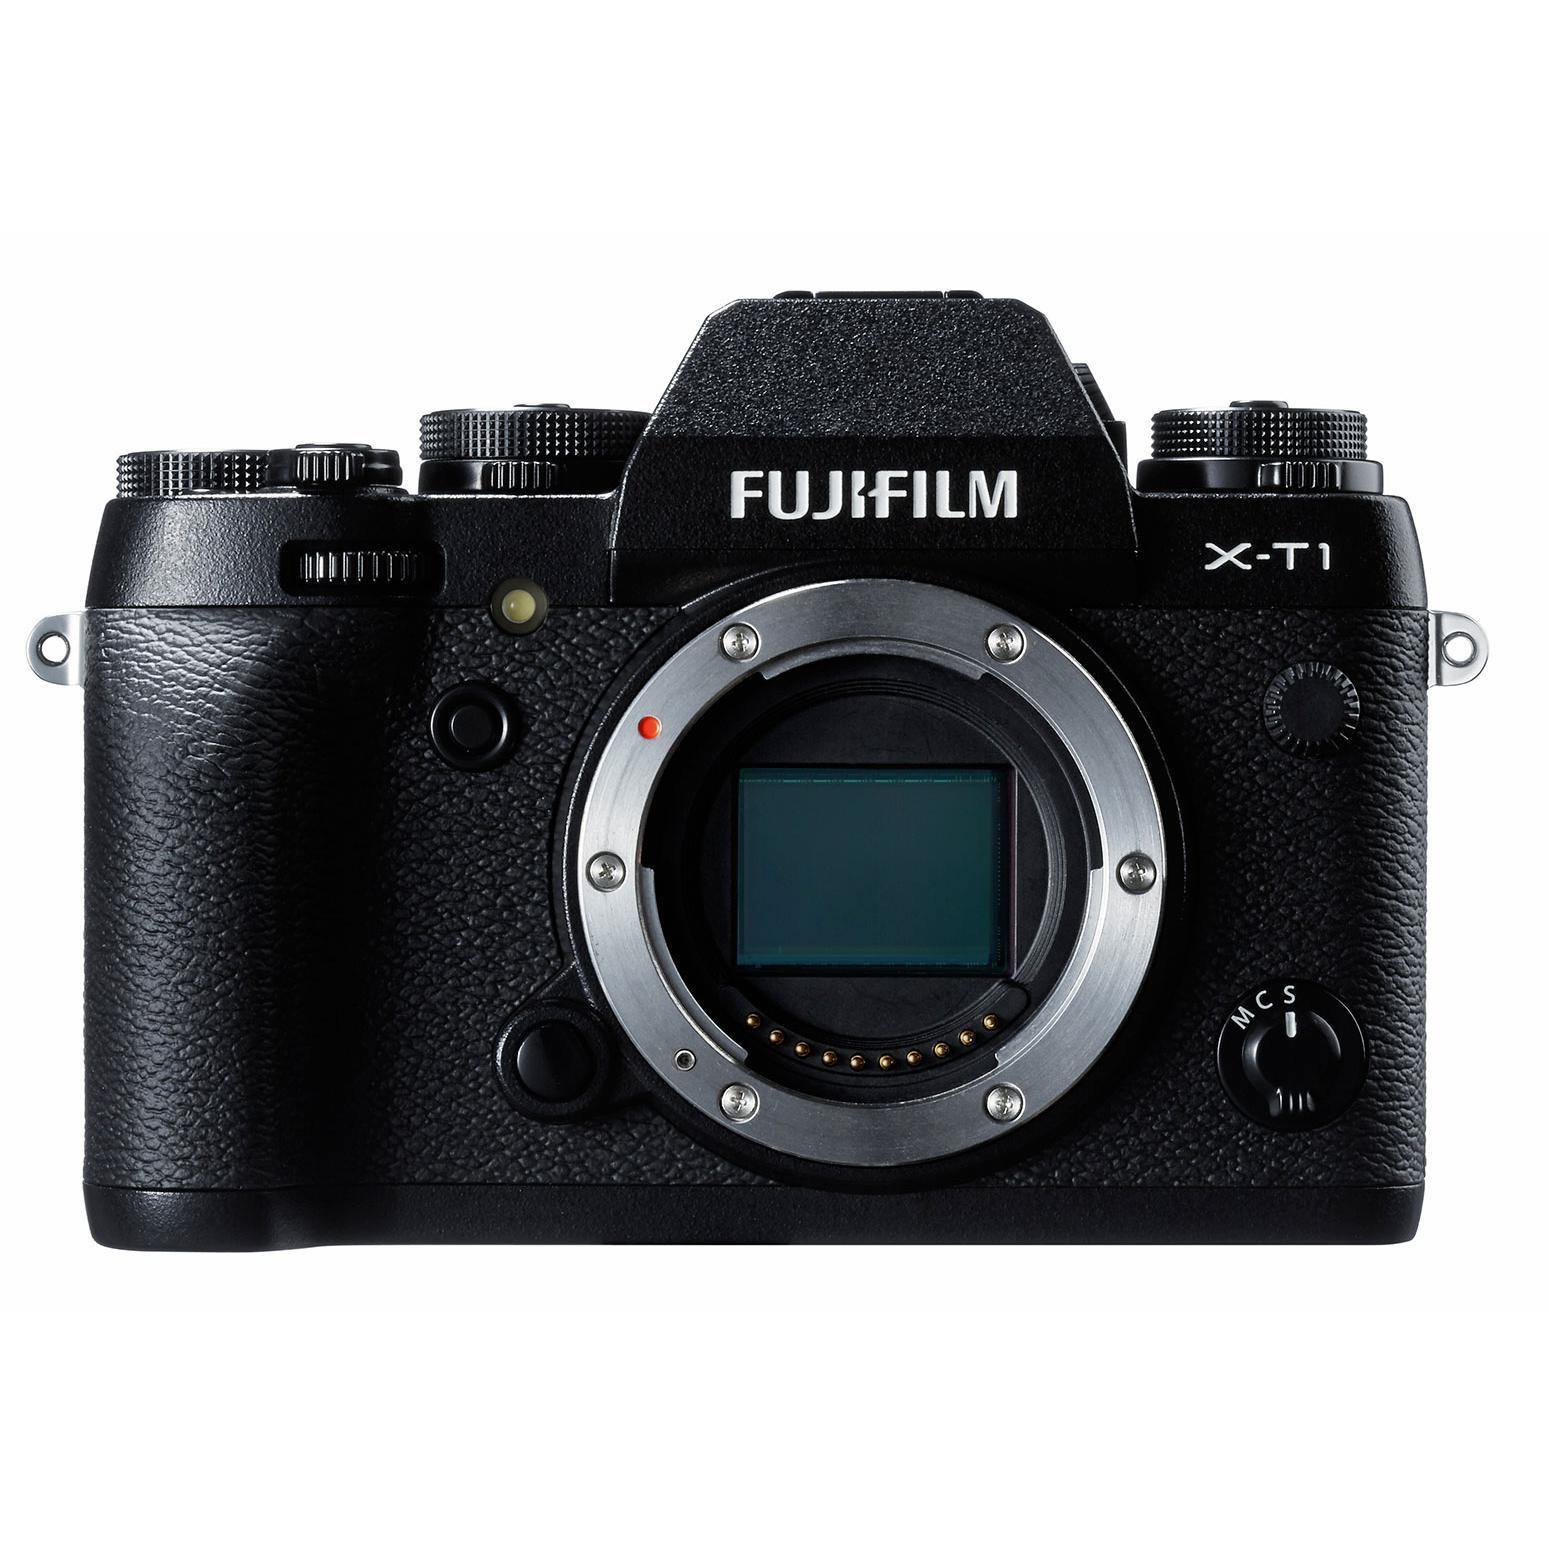 Hybride - Fujifilm X-T1 Boîtier nu - Noir